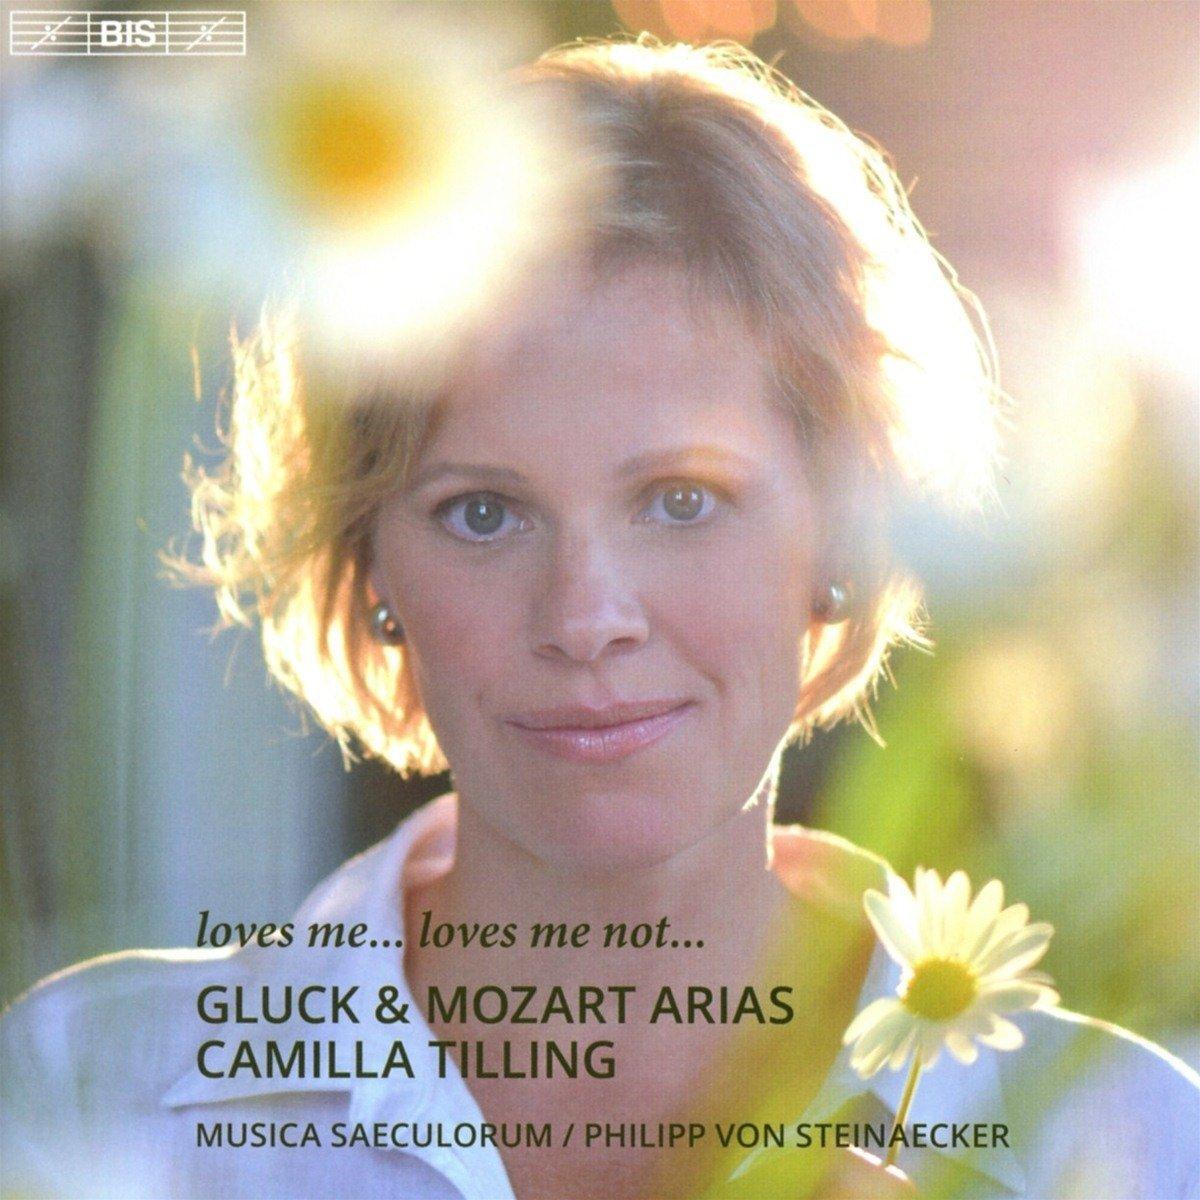 SACD : Camilla/Gluck & Mozart Tilling - Loves Me...loves Me Not... (SACD)